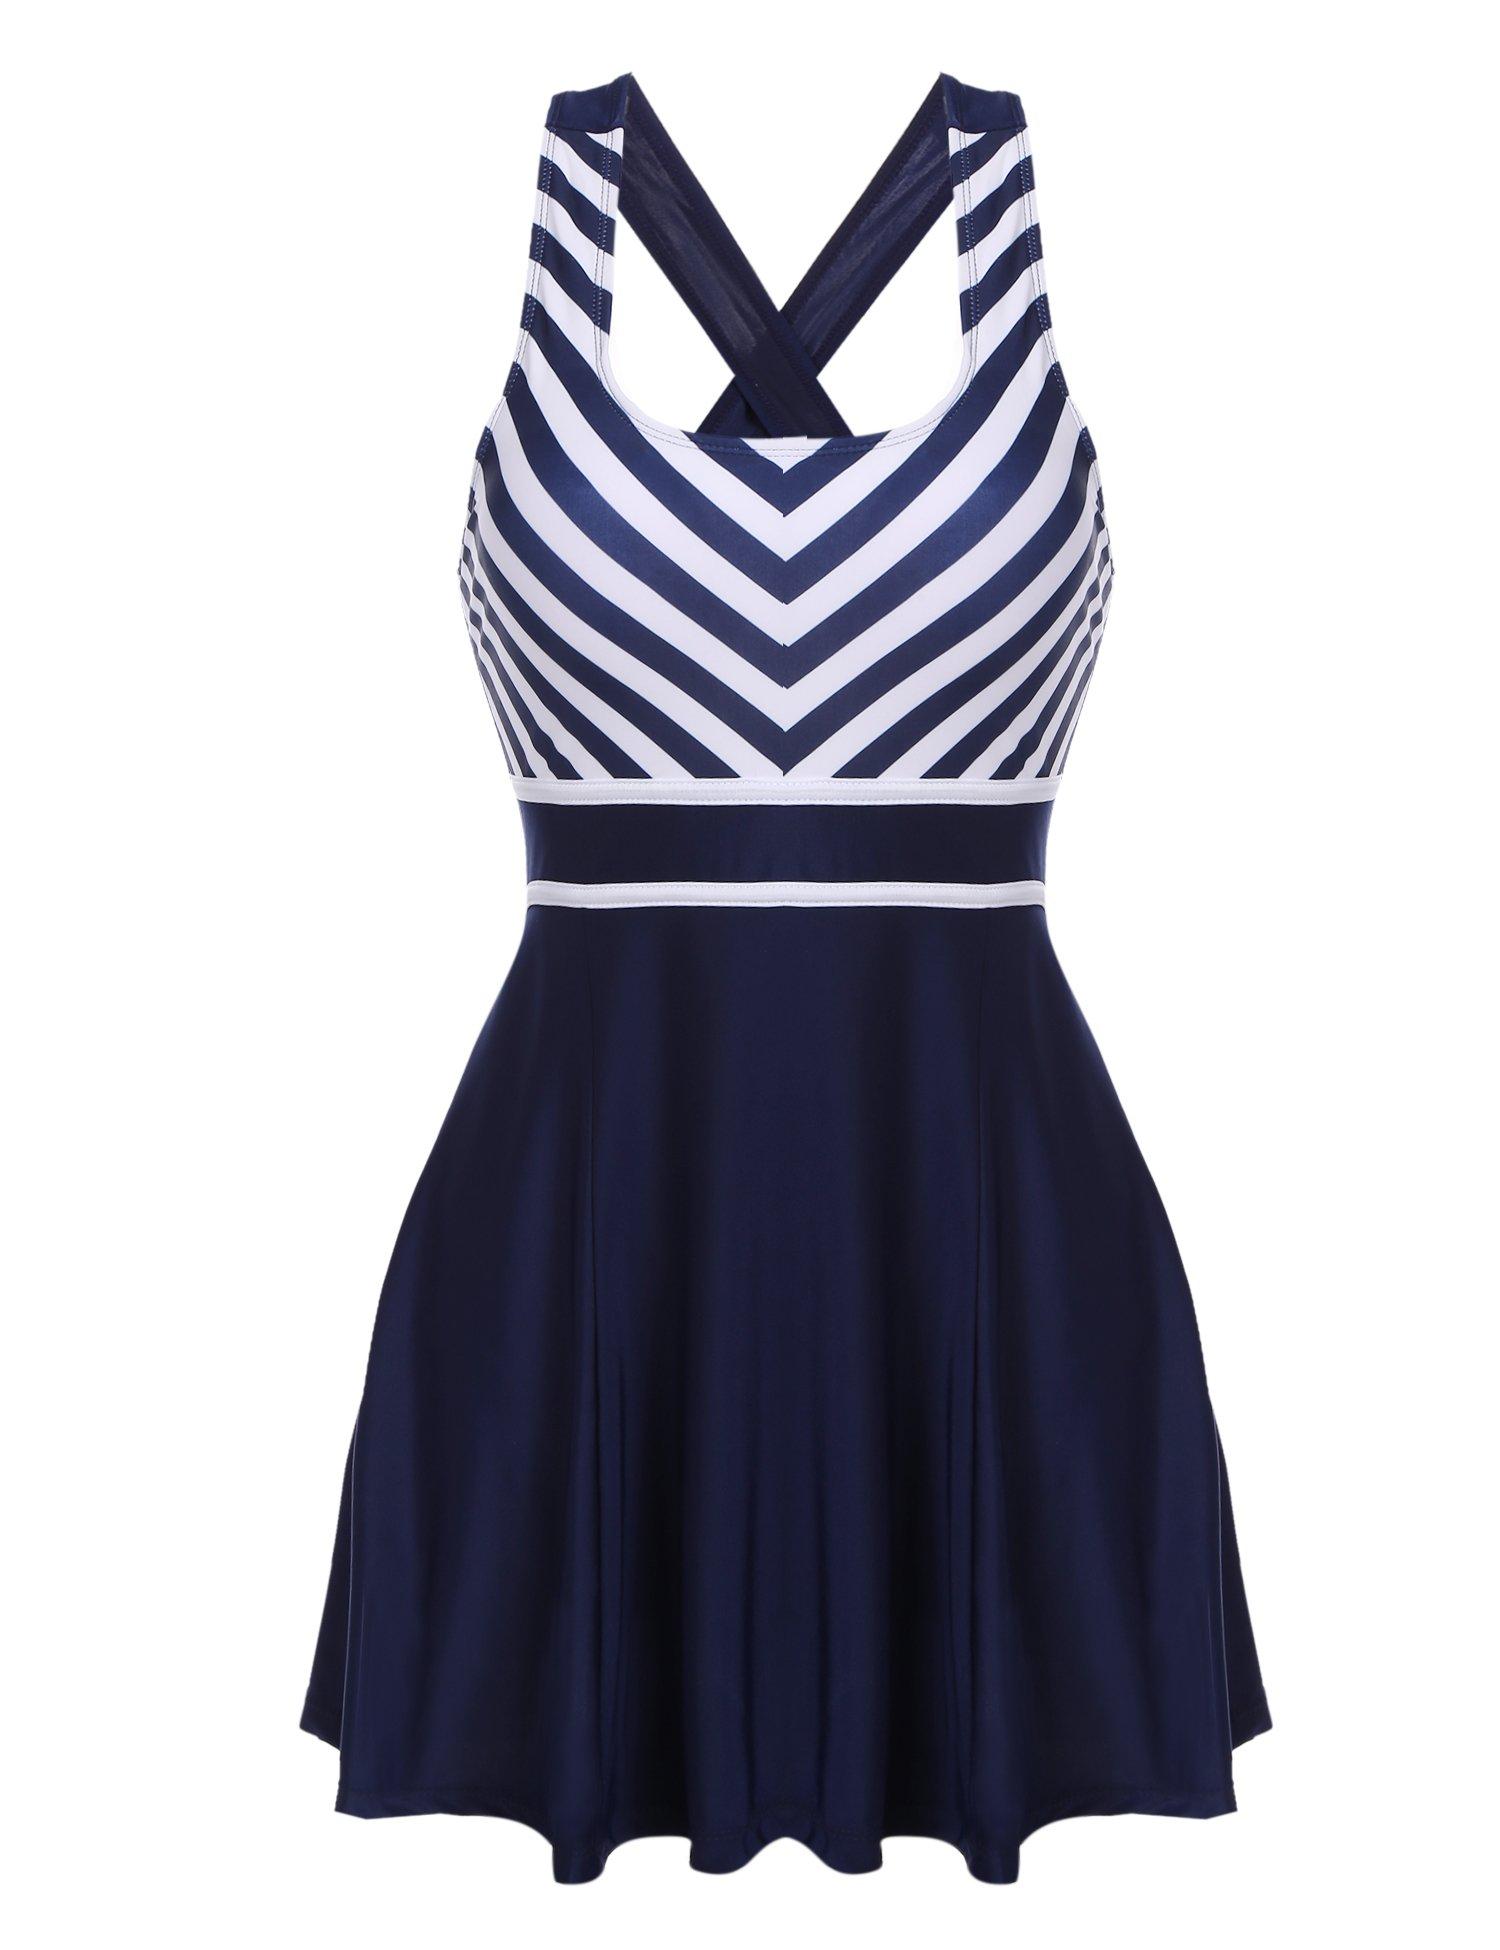 ADOME Women's High Waist Striped Printing Swimsuit Bathing Swimwear(Navy Blue,M)